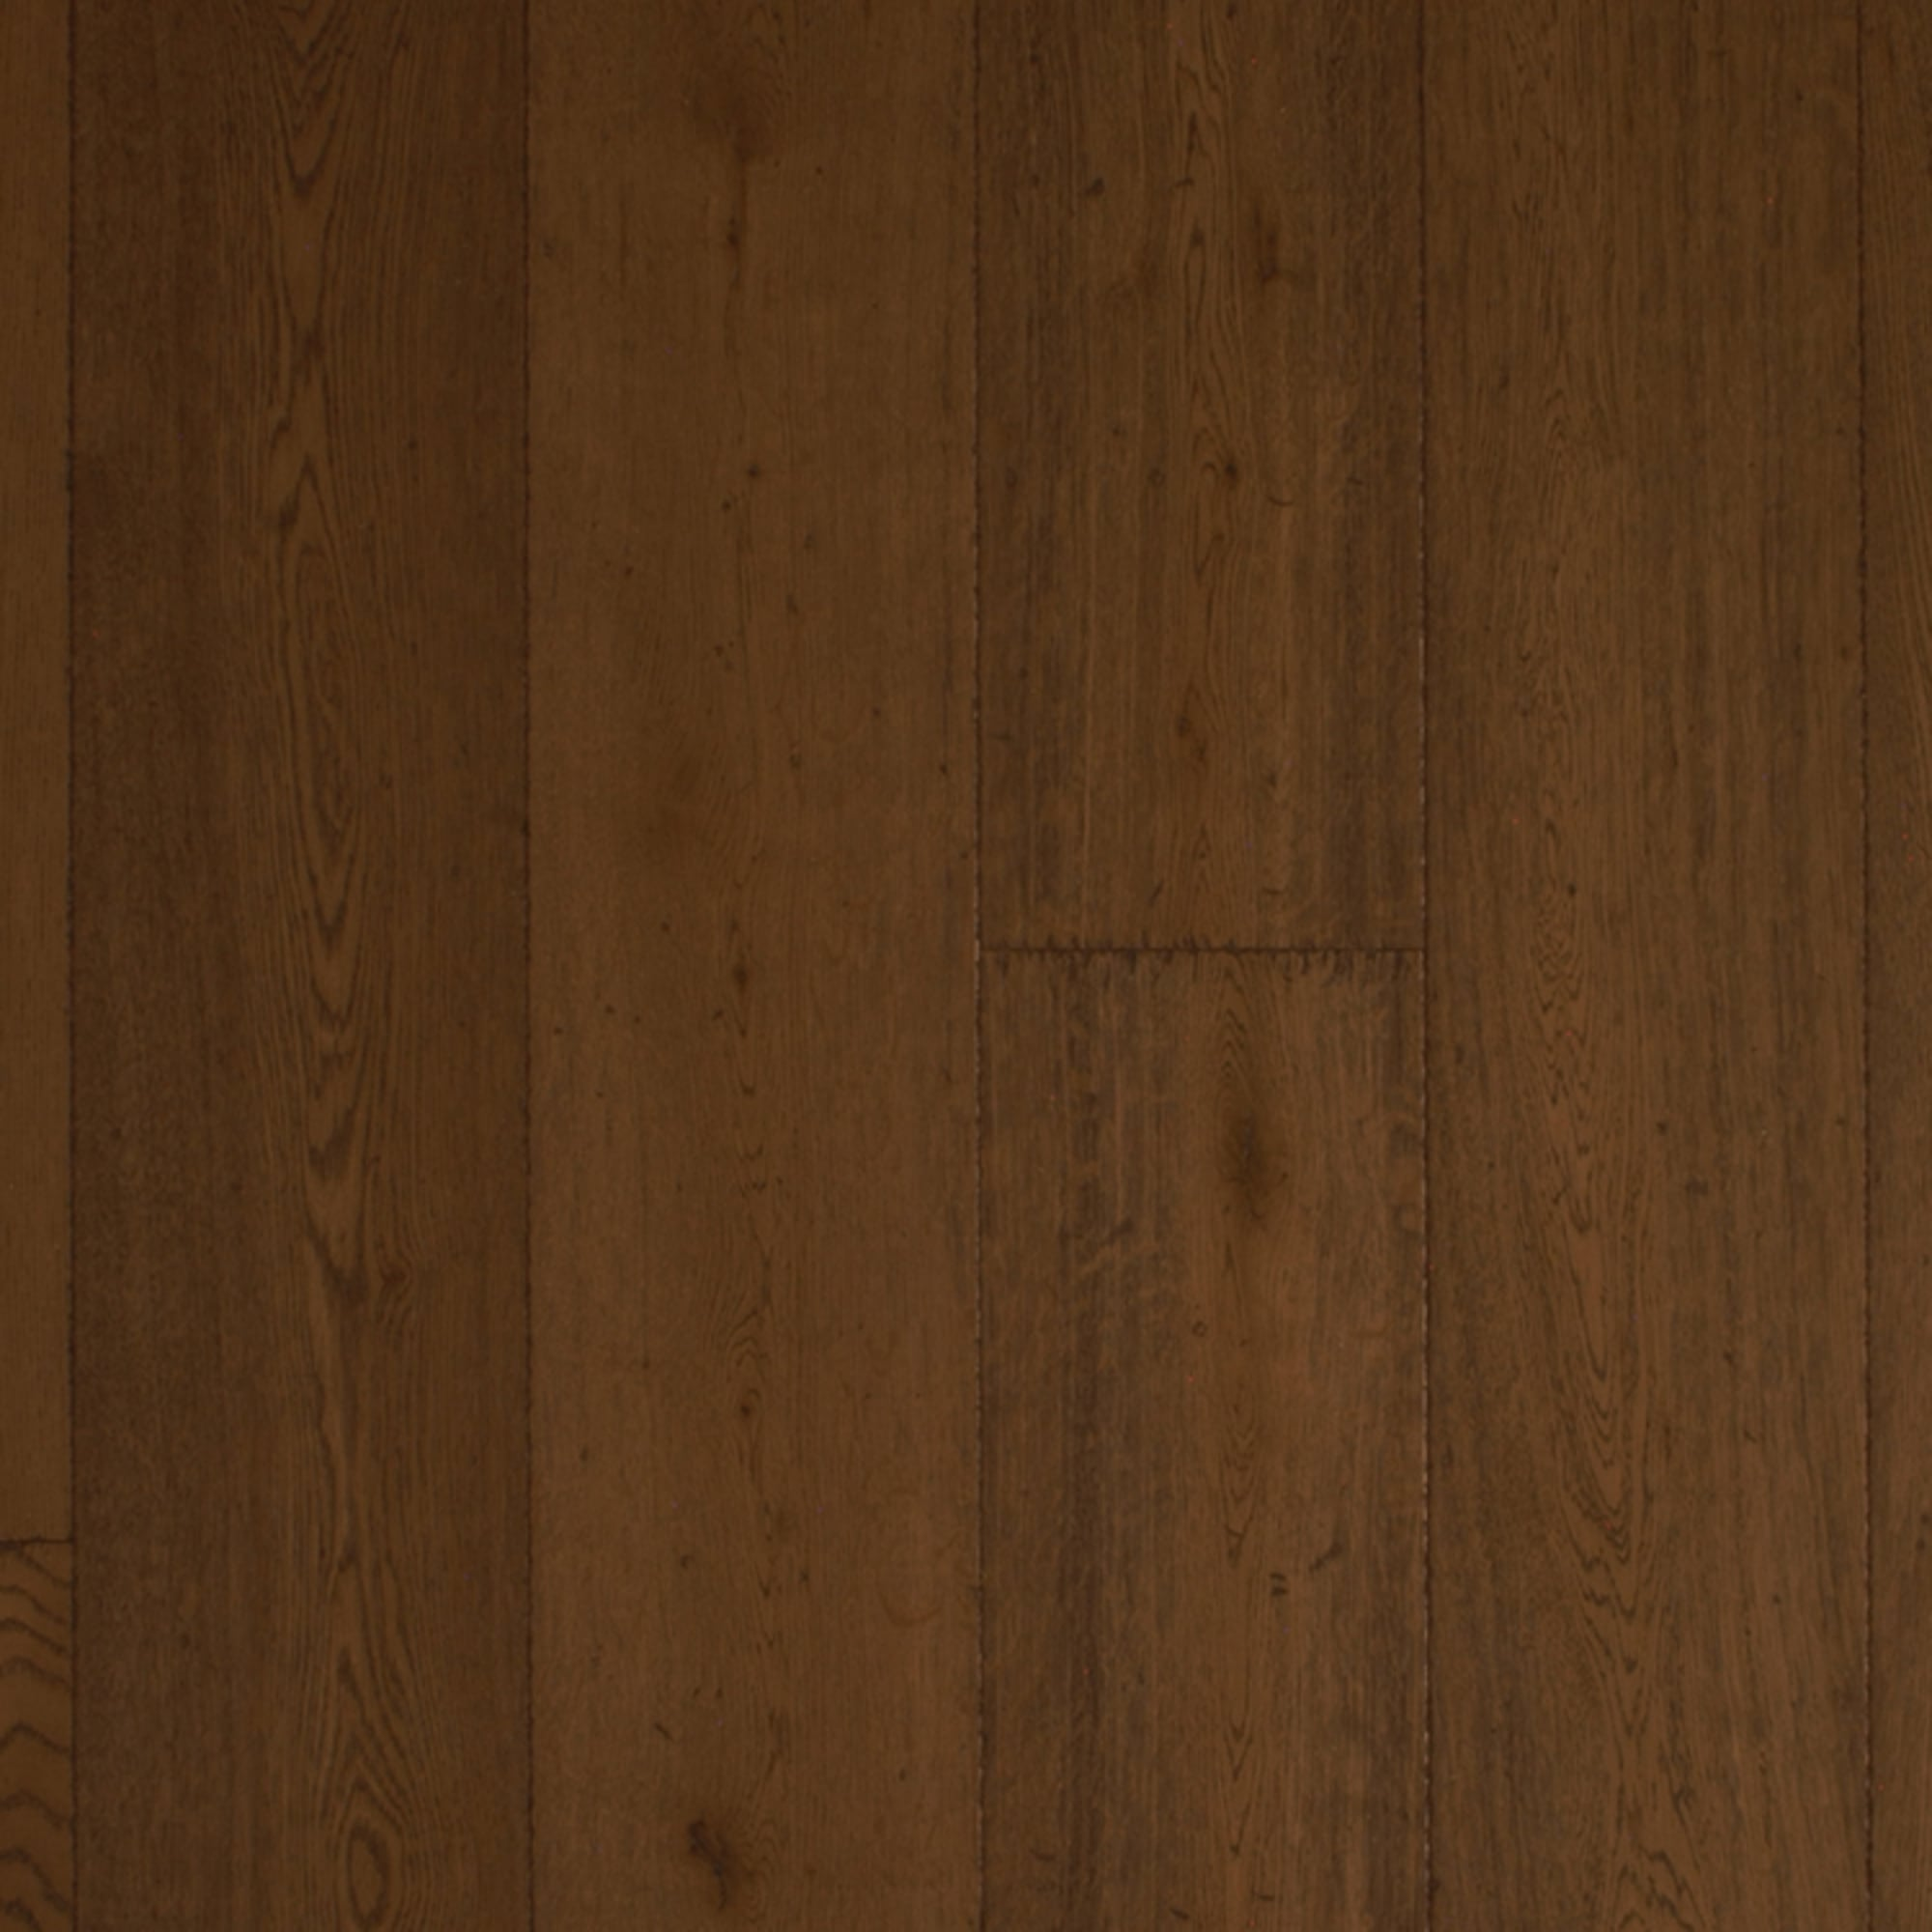 Wood flooring 14x189mm hand worn antique tumbled edge Worn wood floors